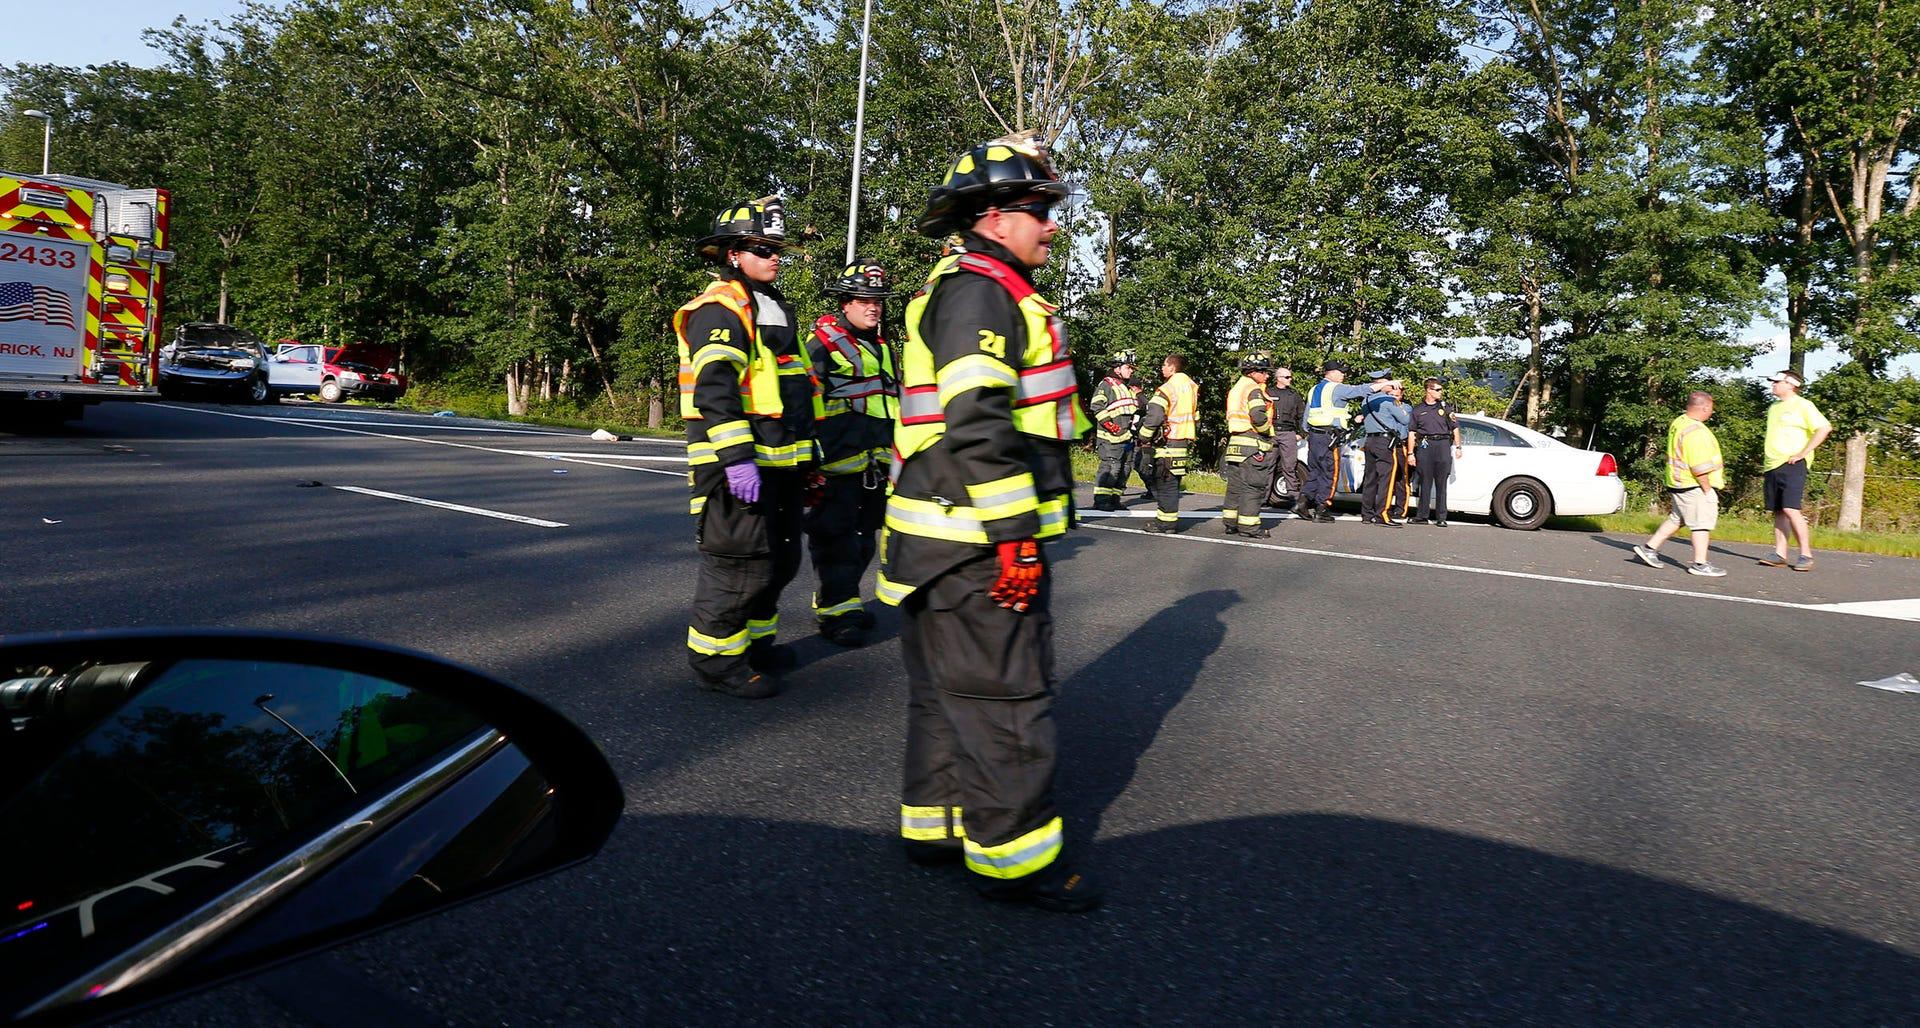 Fatal car crash on Garden State Parkway in Brick